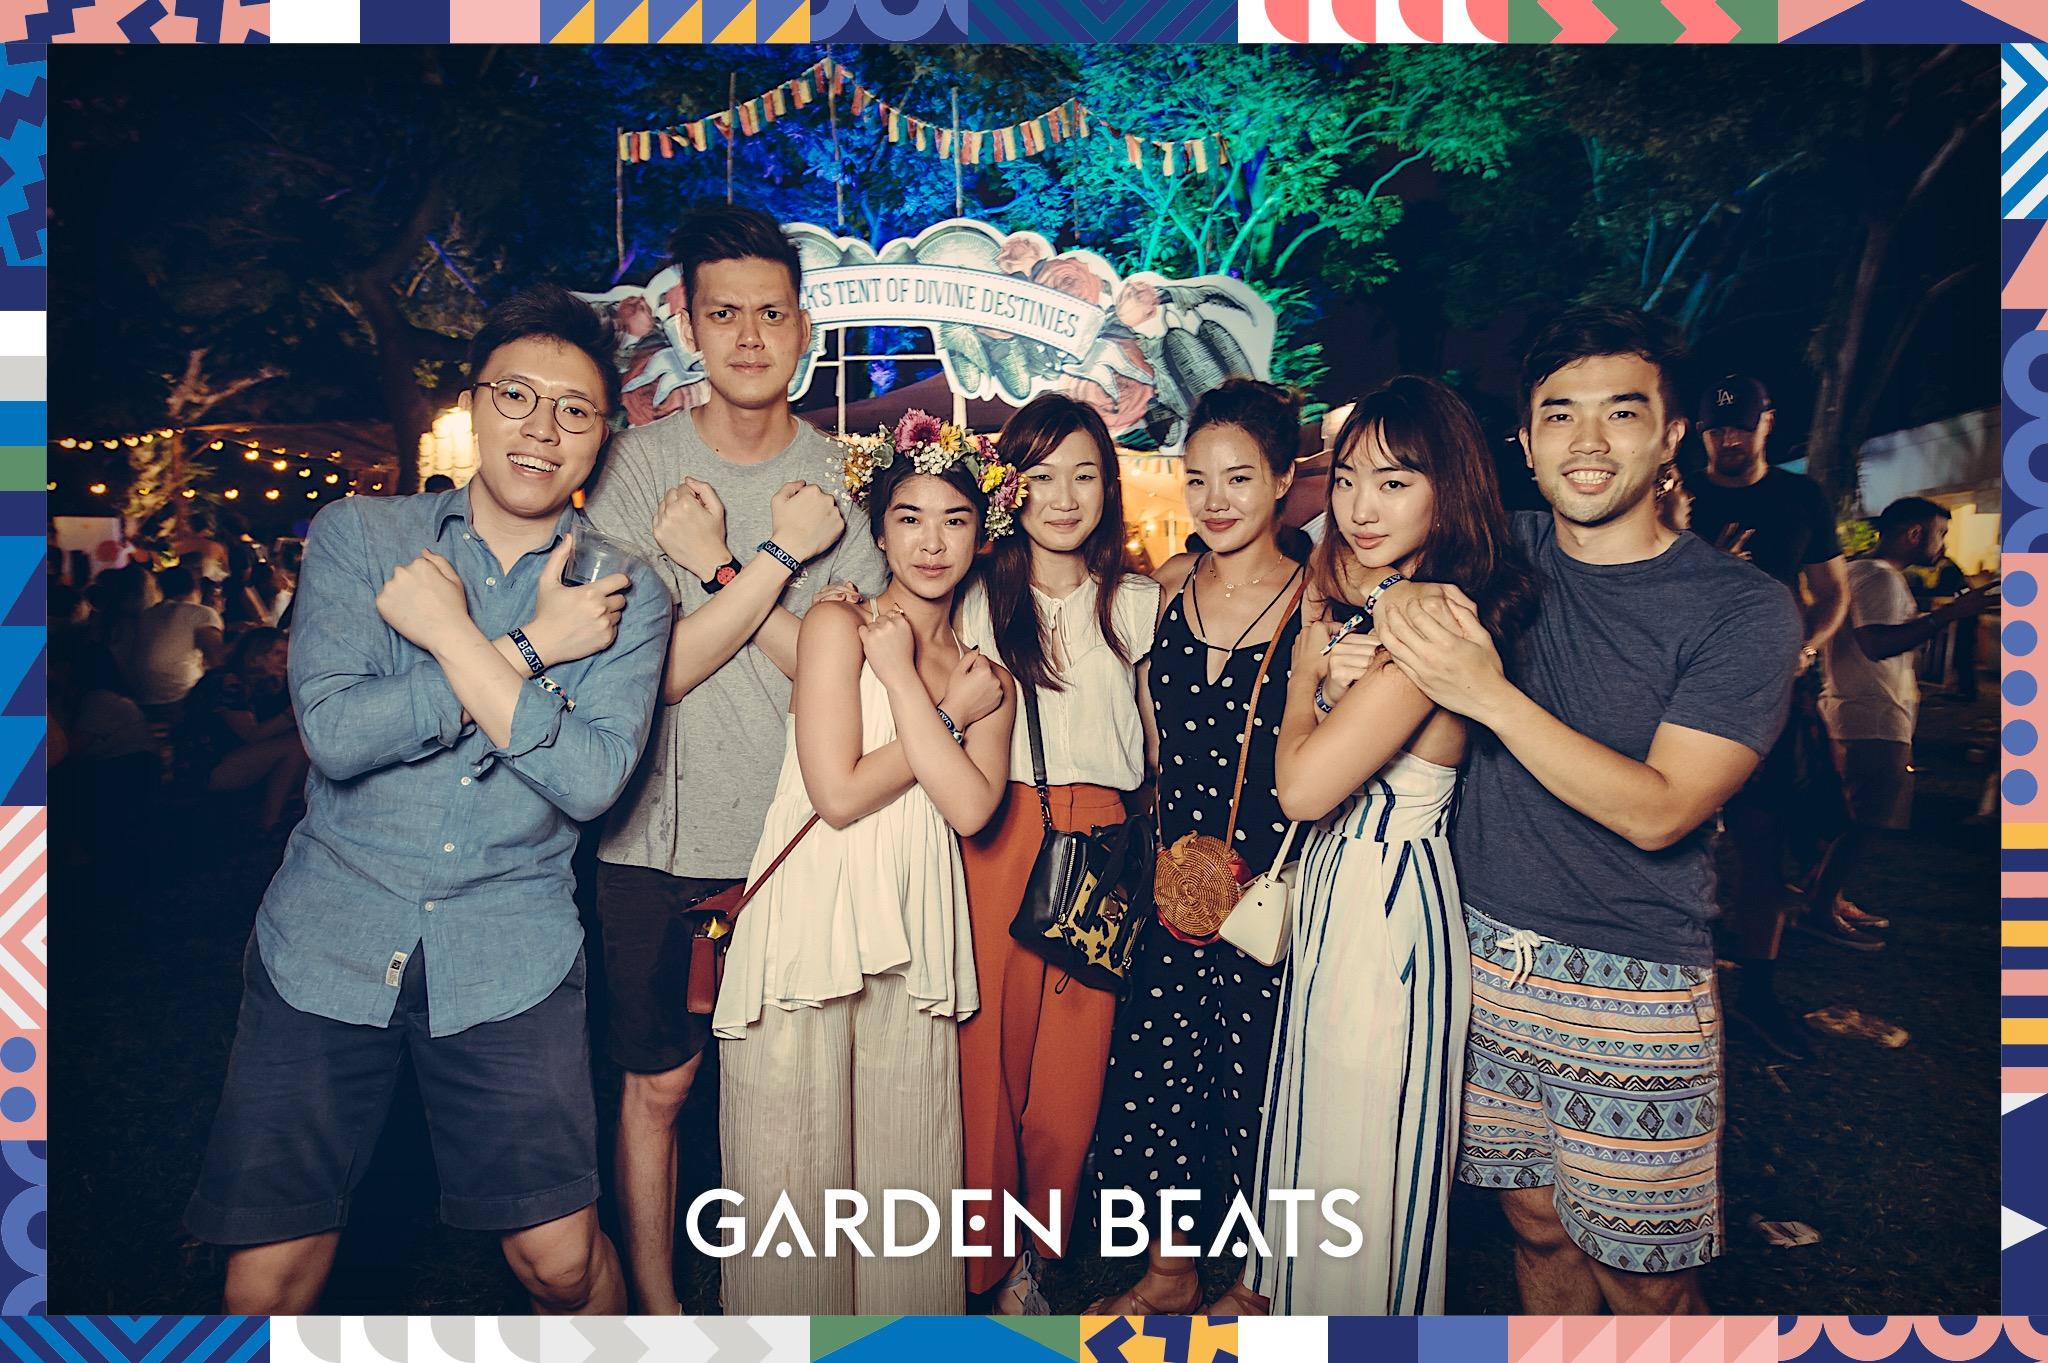 03032018_GardenBeats_Colossal928_Watermarked.jpg